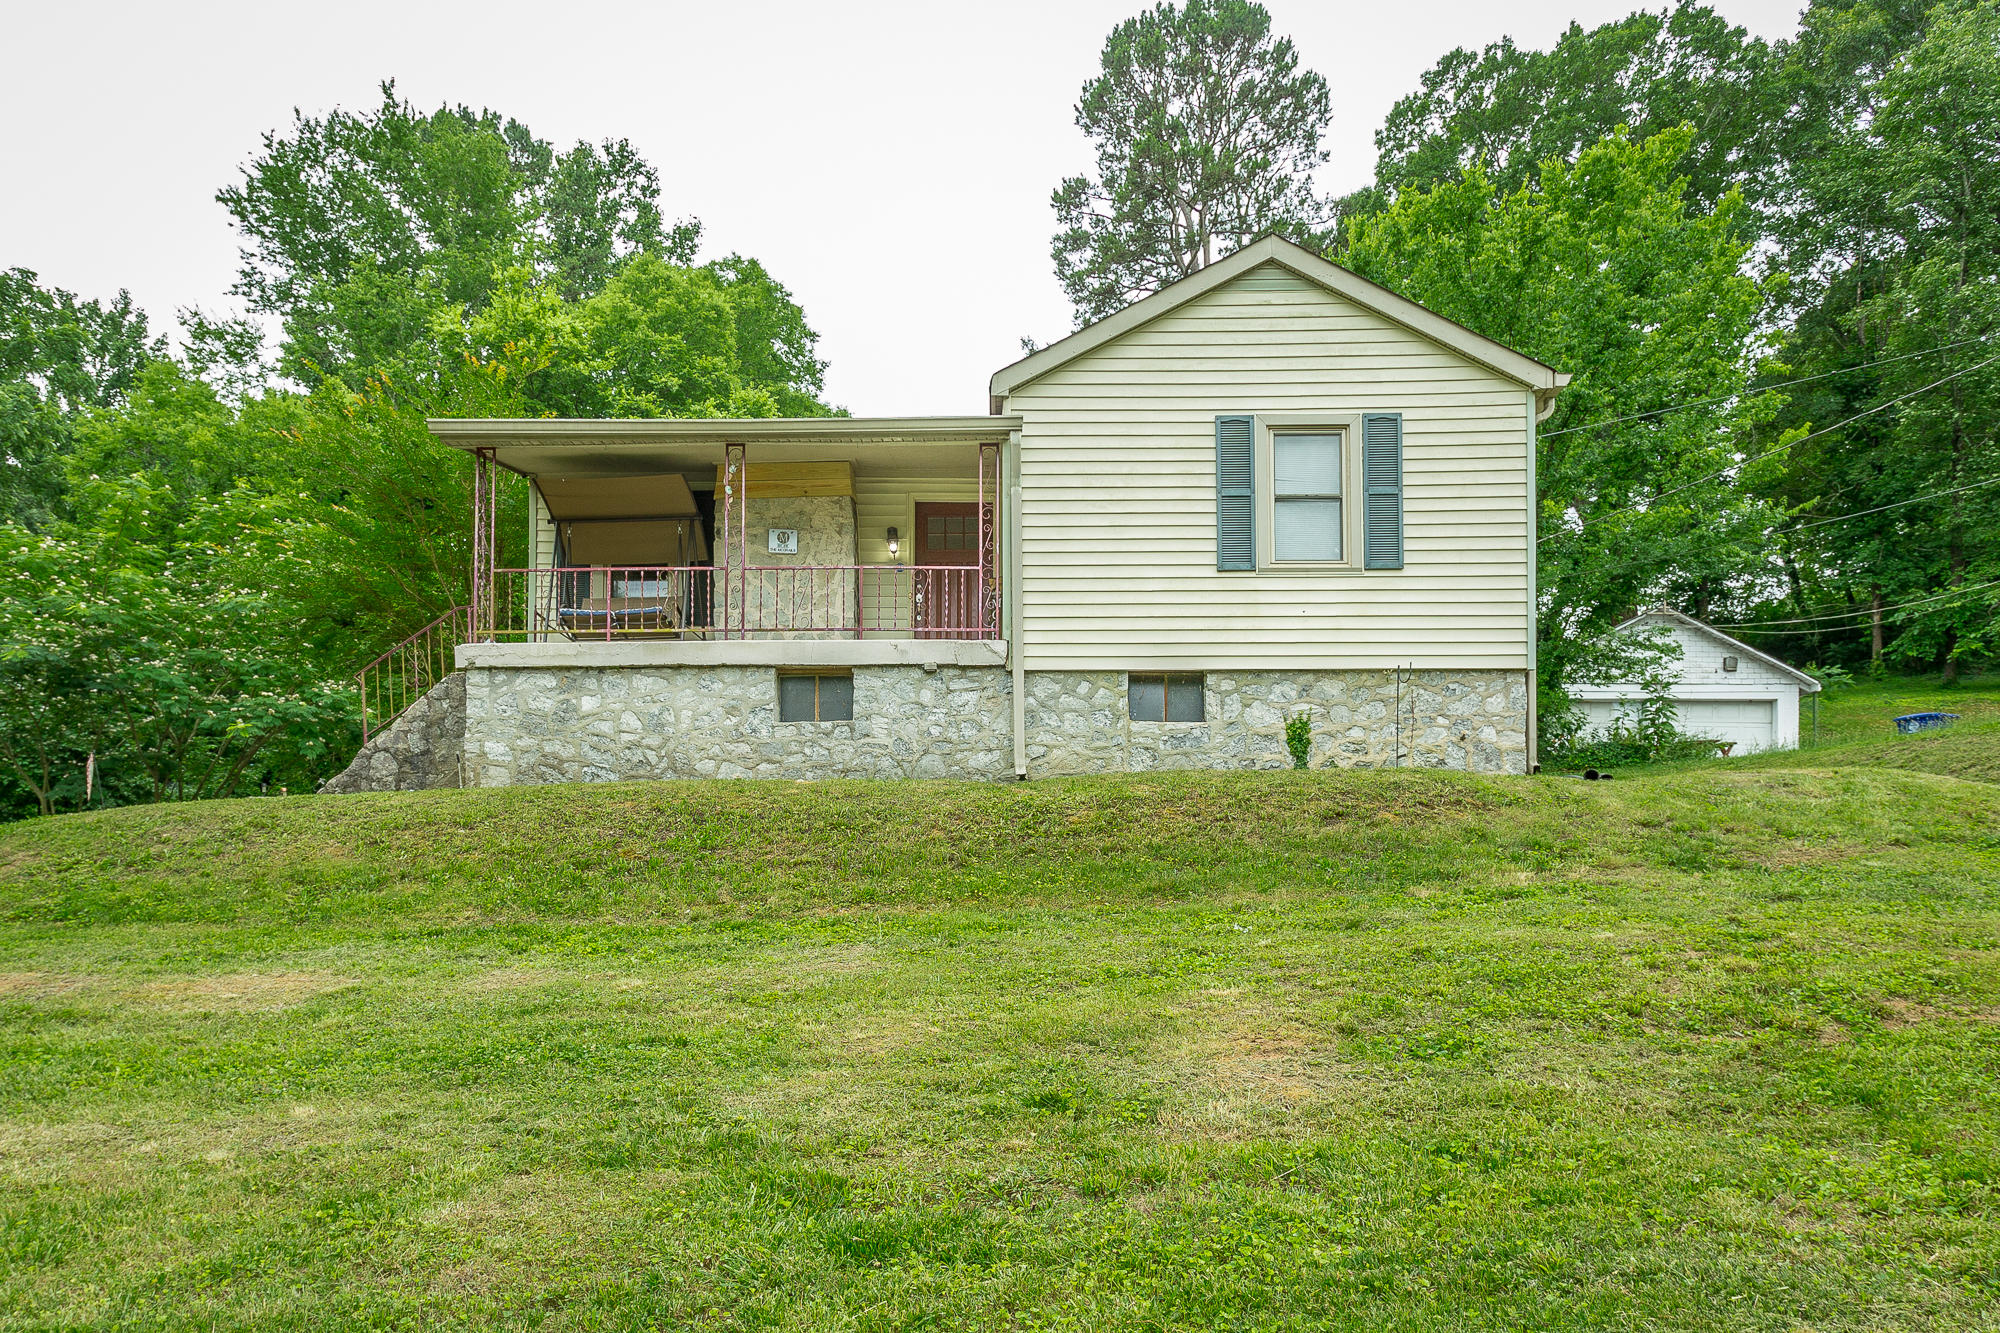 4034 Bonny Oaks Dr, Chattanooga, TN 37406